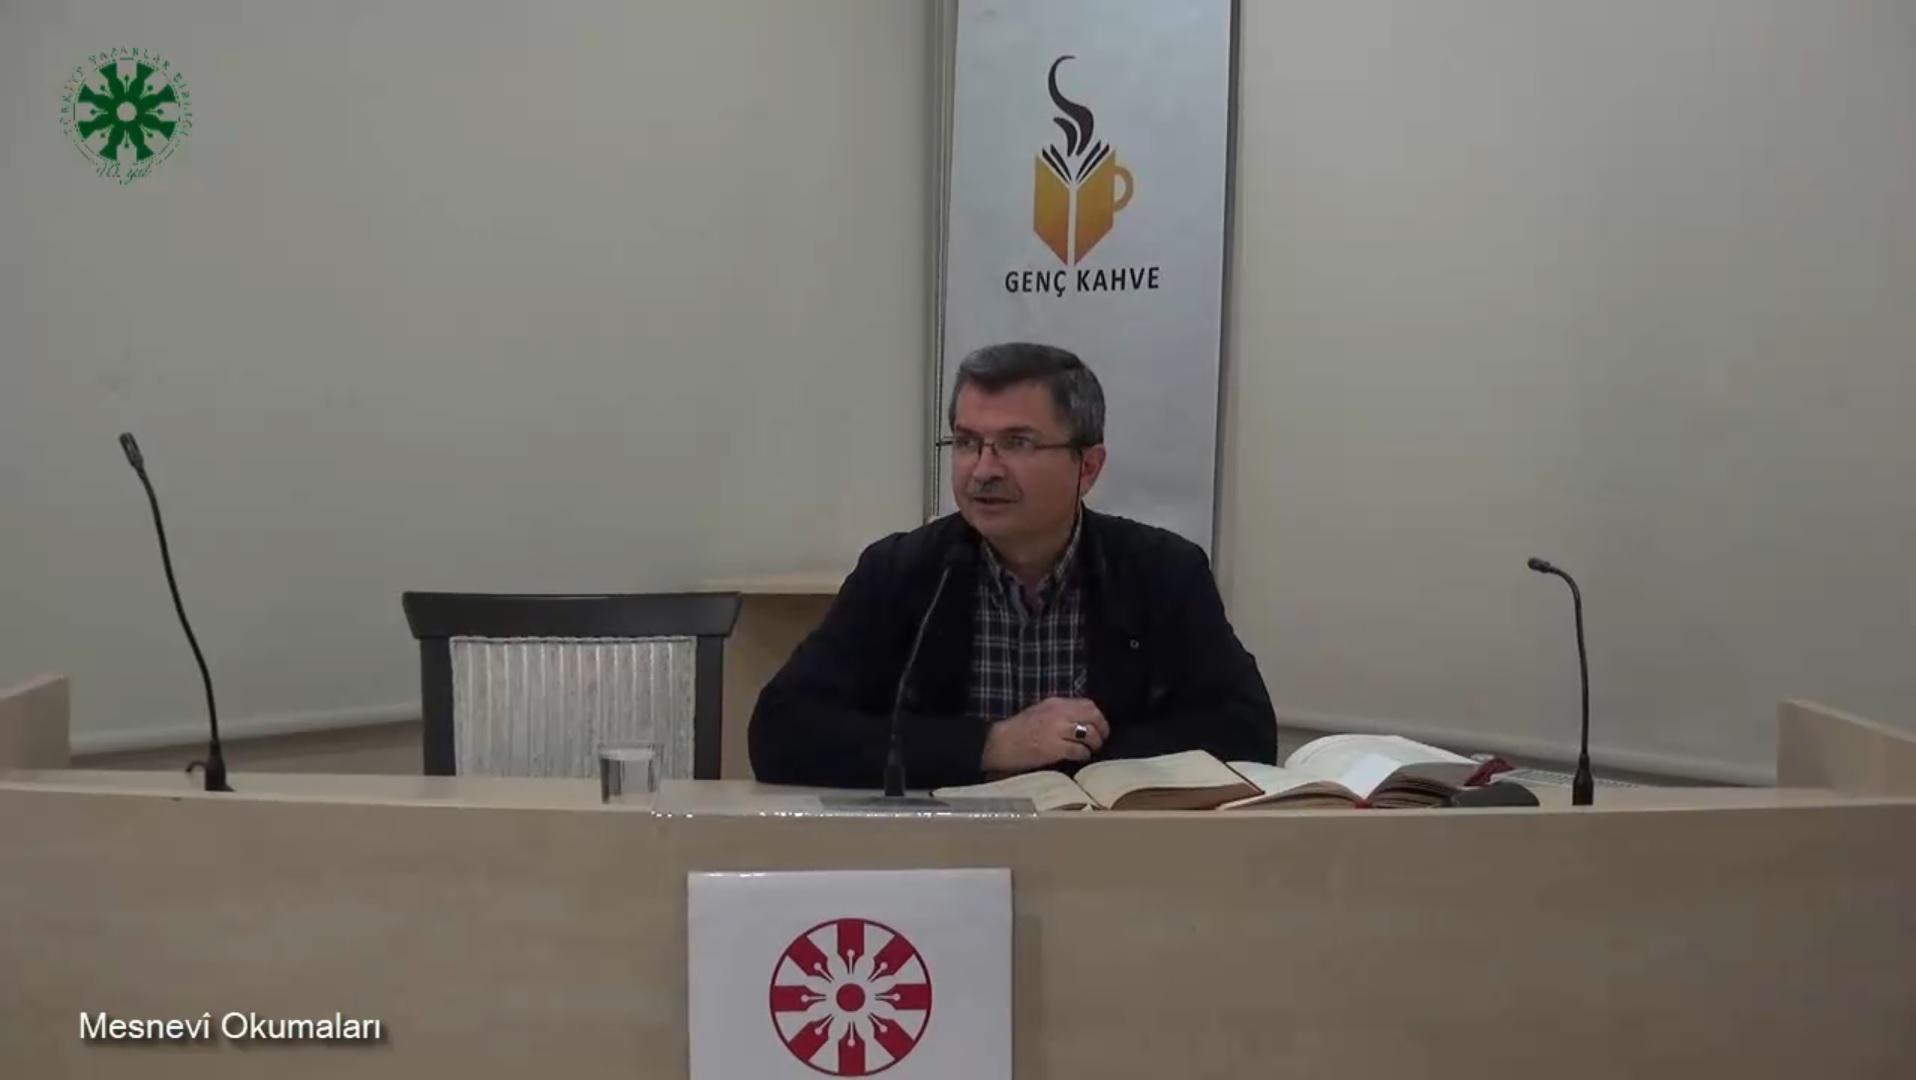 Mesnevî Okumaları -24- Dr. Fahrettin Coşguner (video)